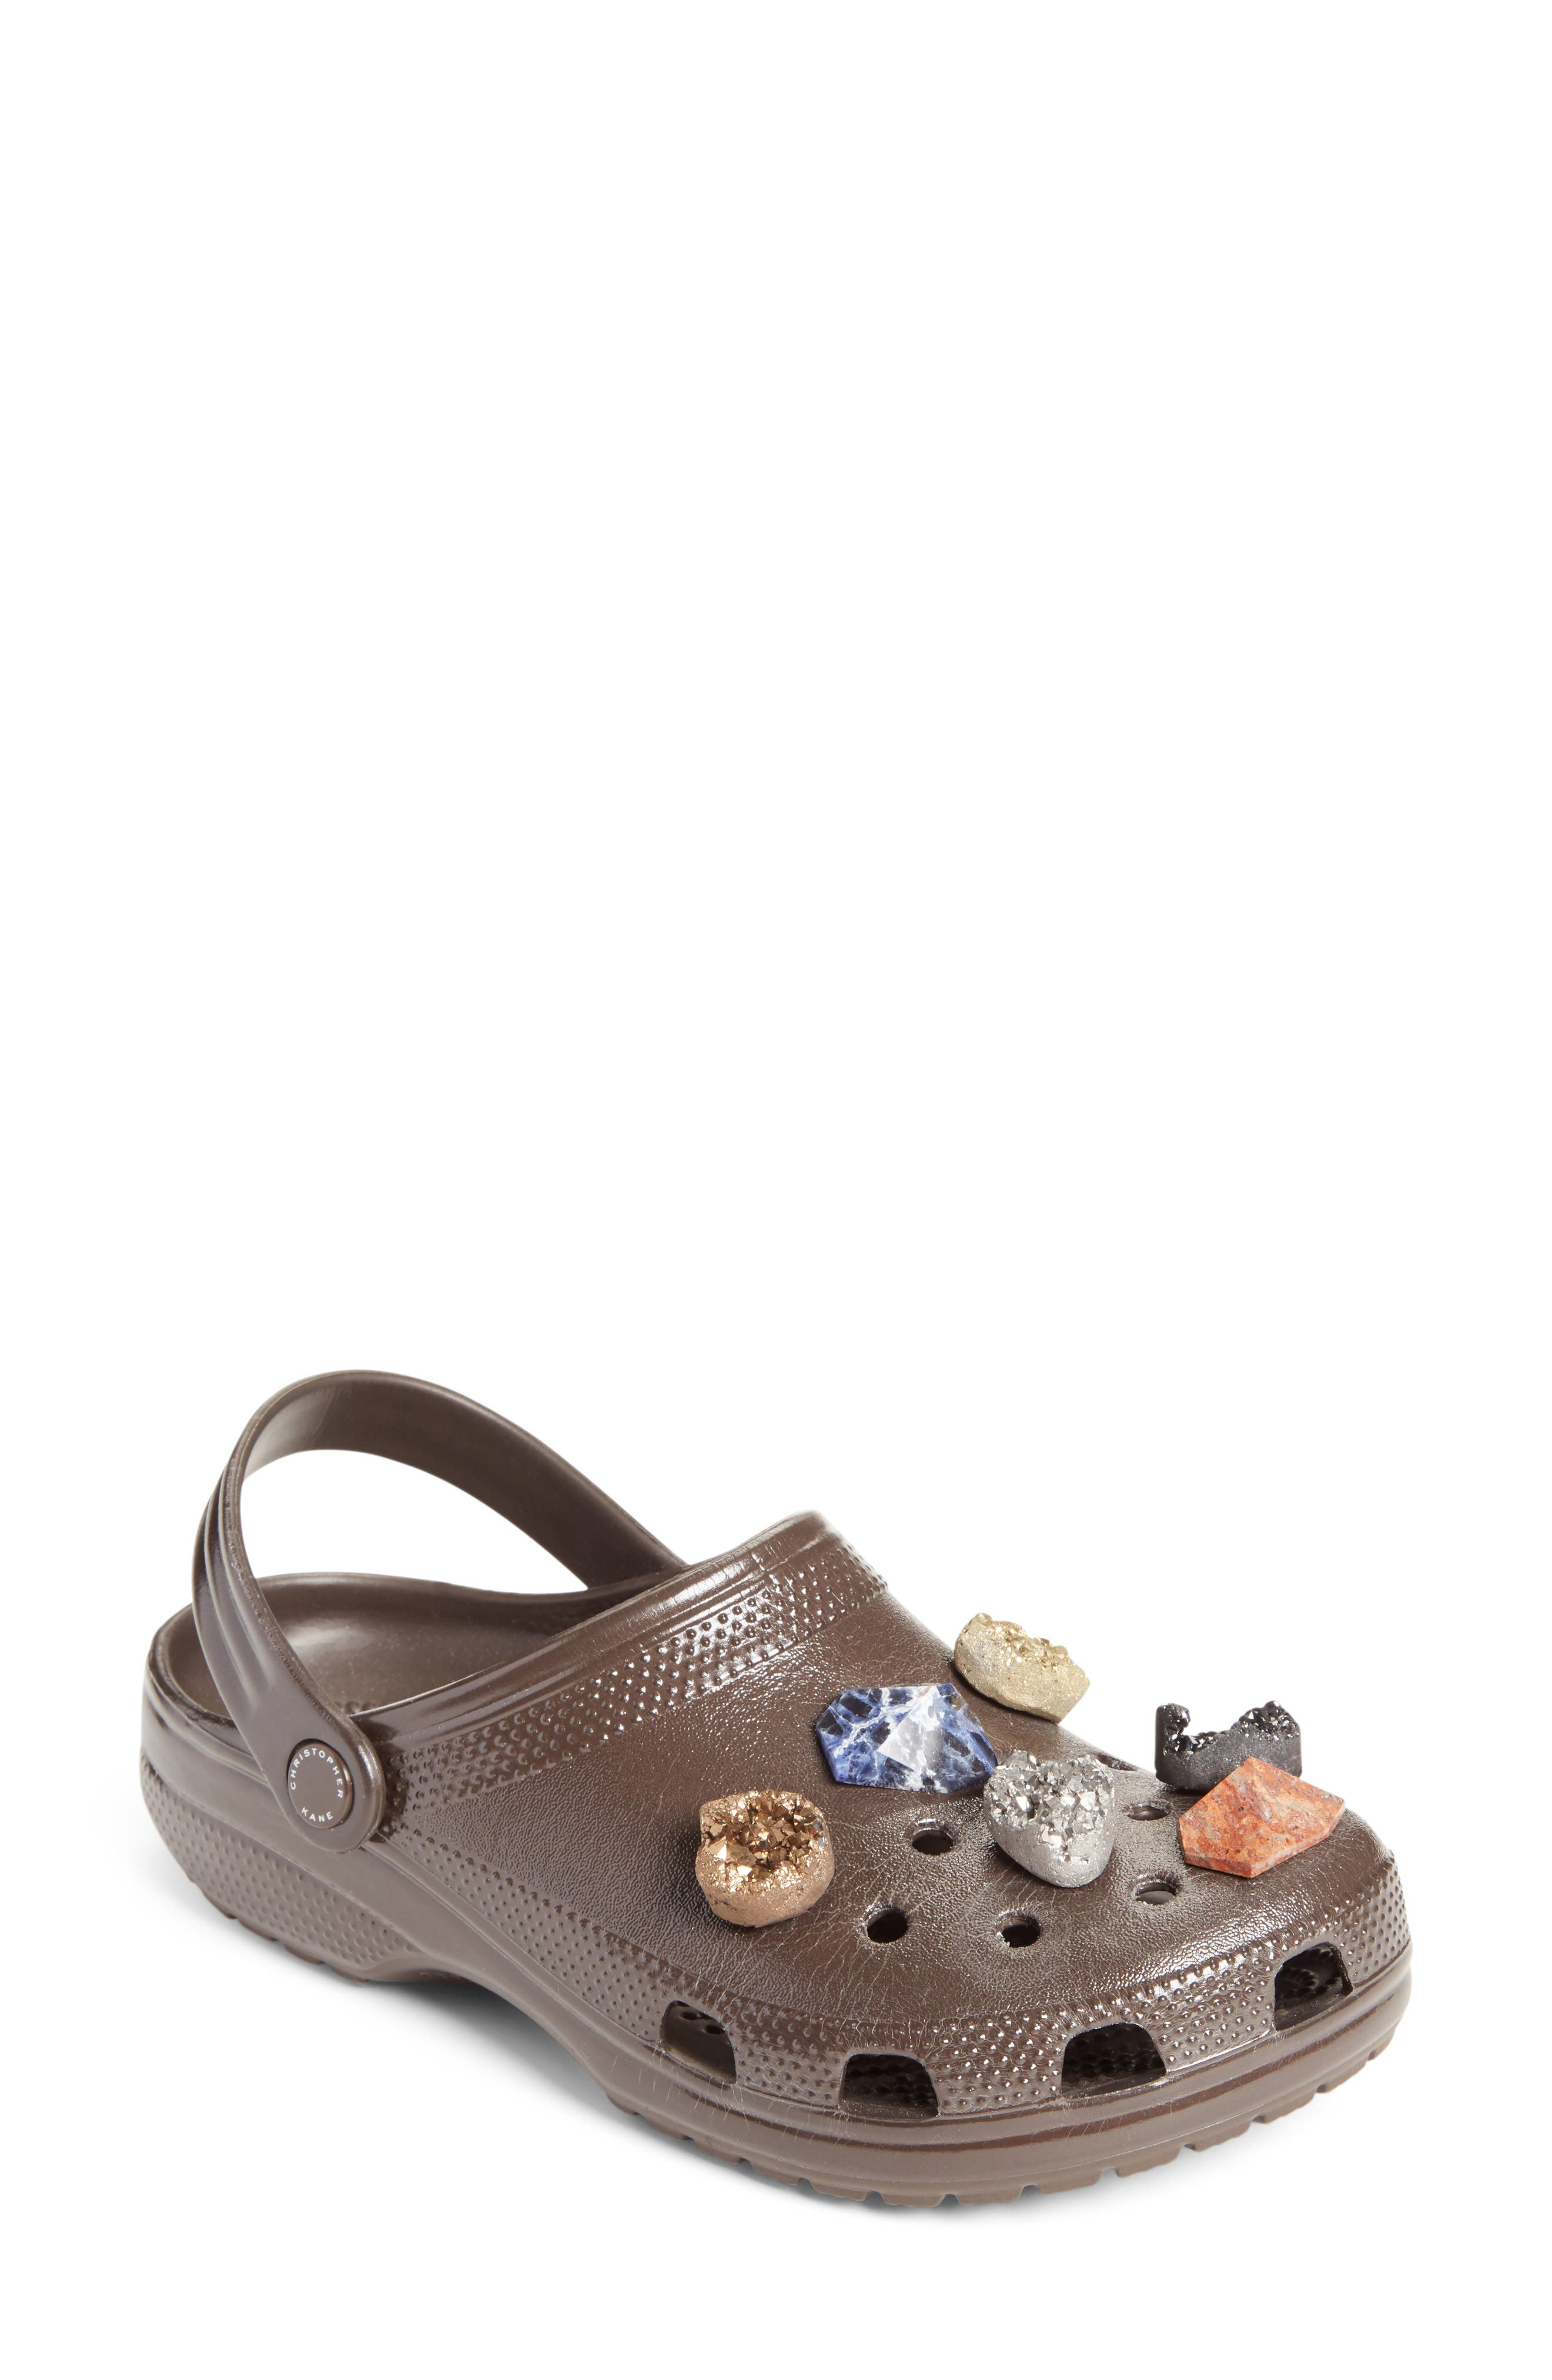 CHRISTOPHER KANE x CROCS<sup>™</sup> Multi Stone Clog Sandal, Main, color, 200